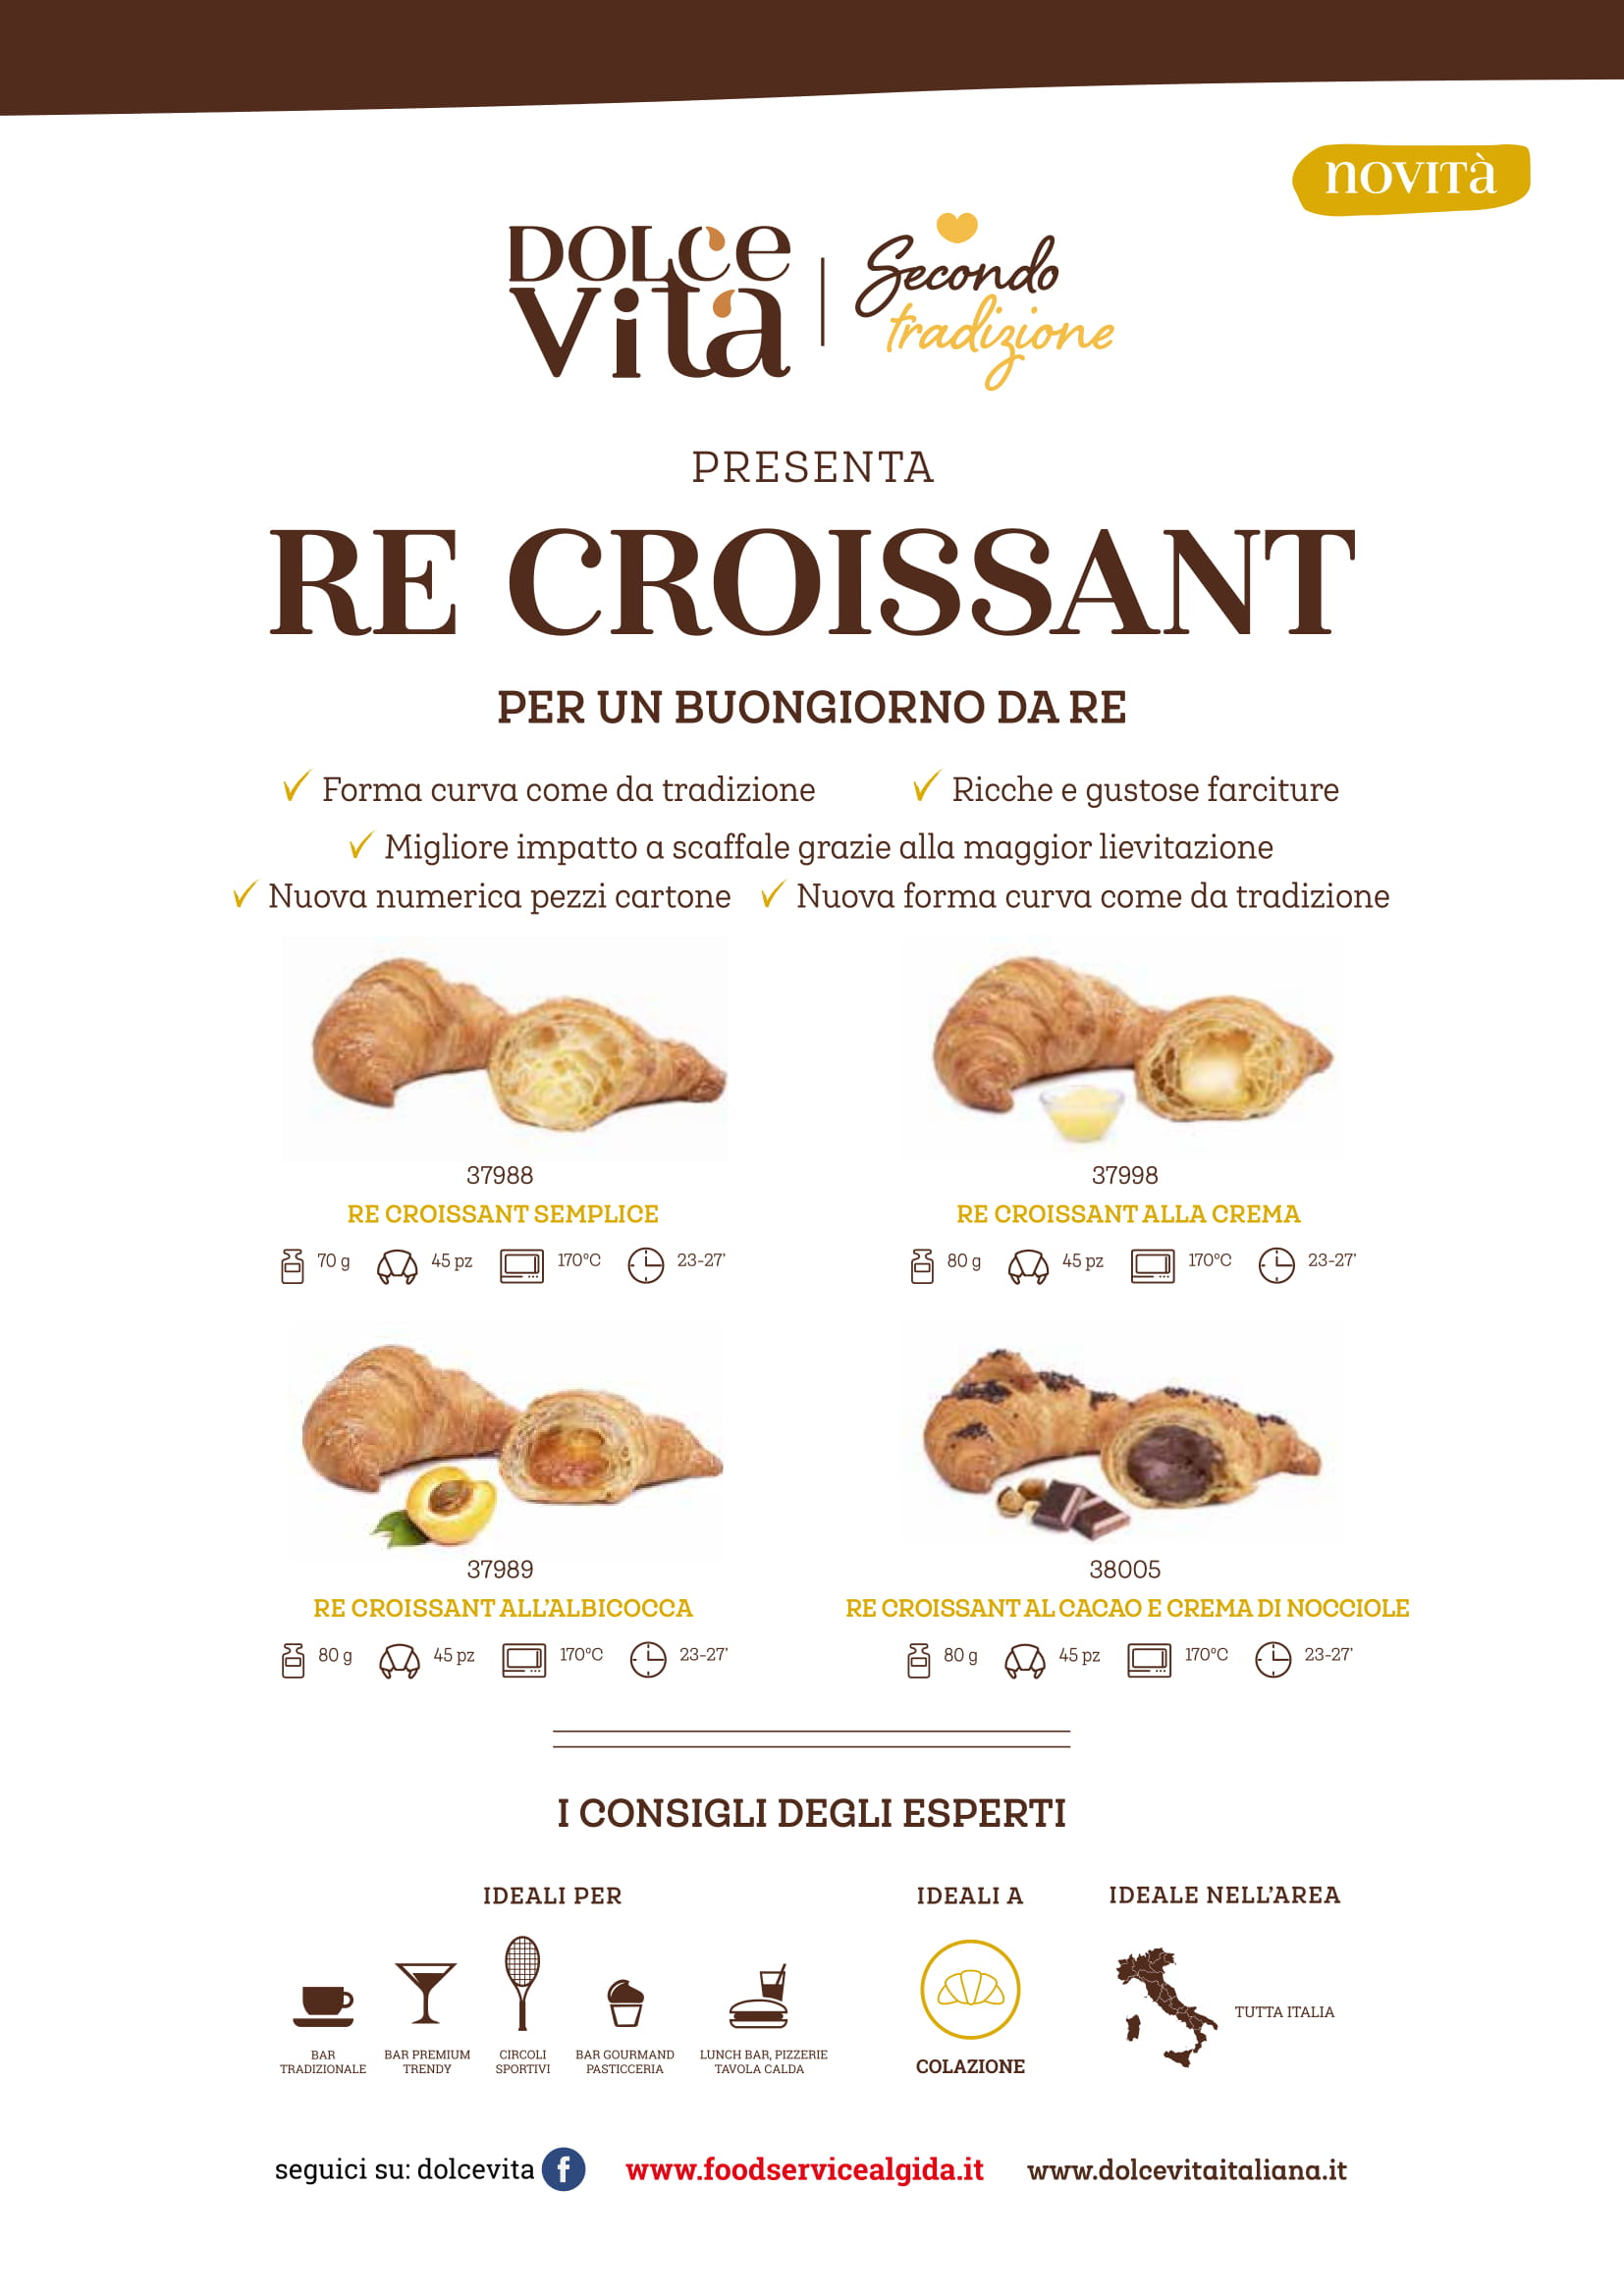 A4_BiancaVolta_Re Croissant_bassa-2